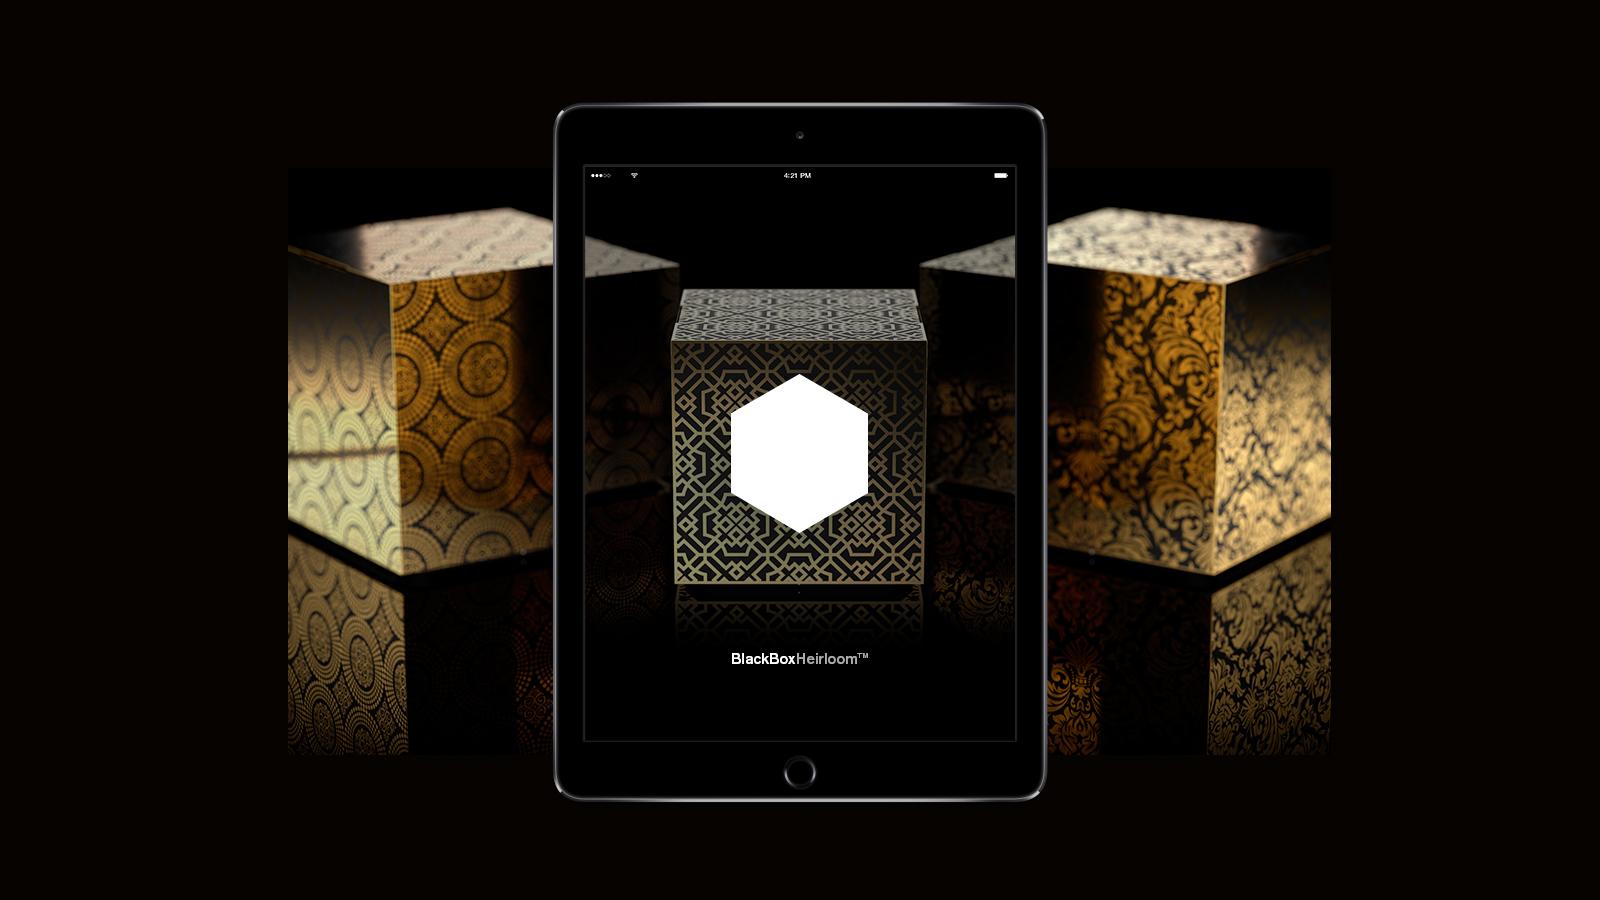 blackbox-hierloom-2